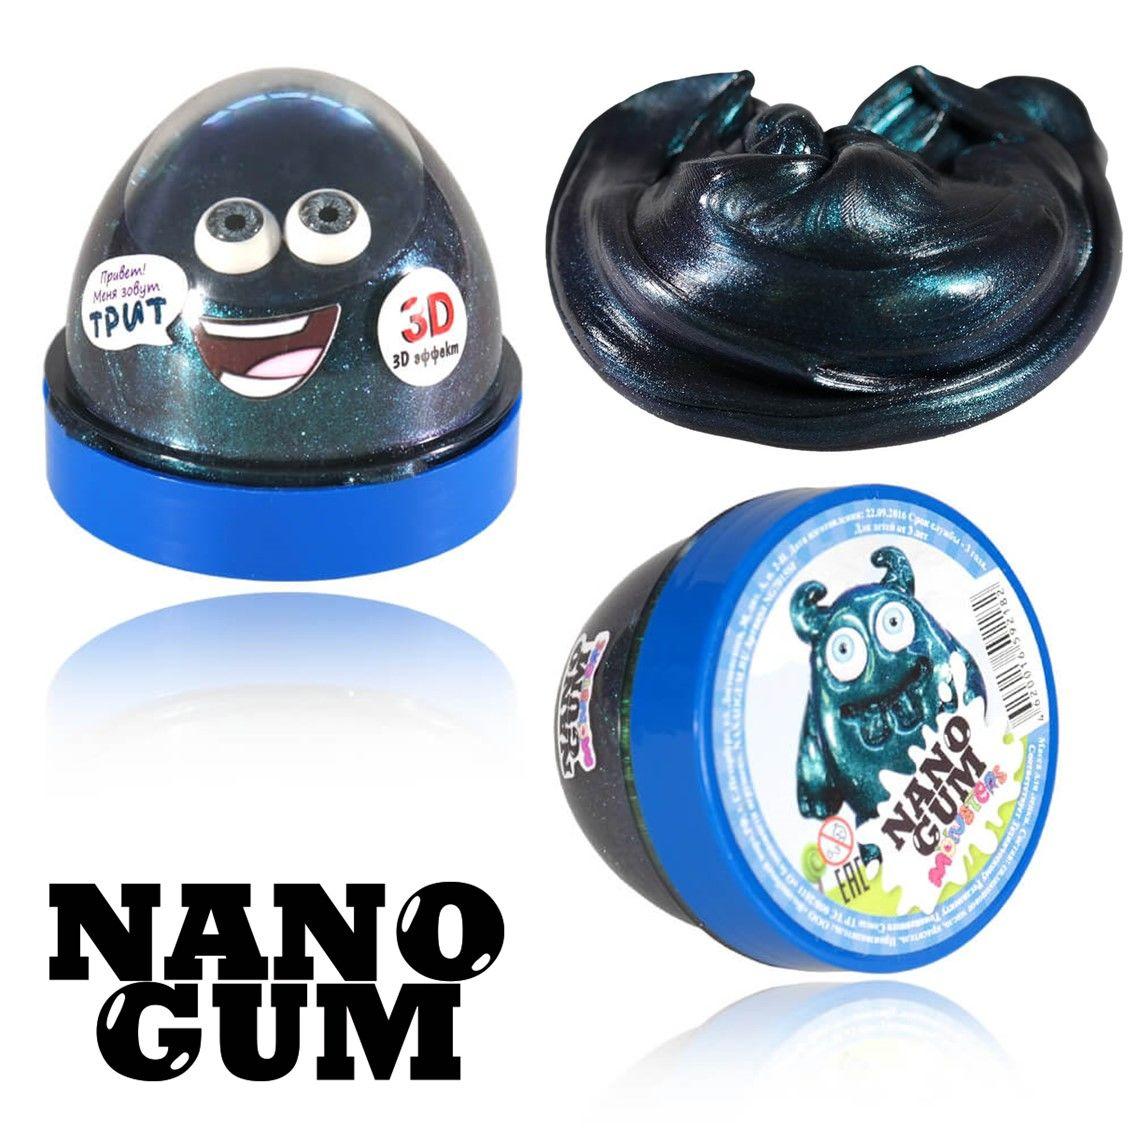 Жвачка для рук Nano gum Трит 50гр